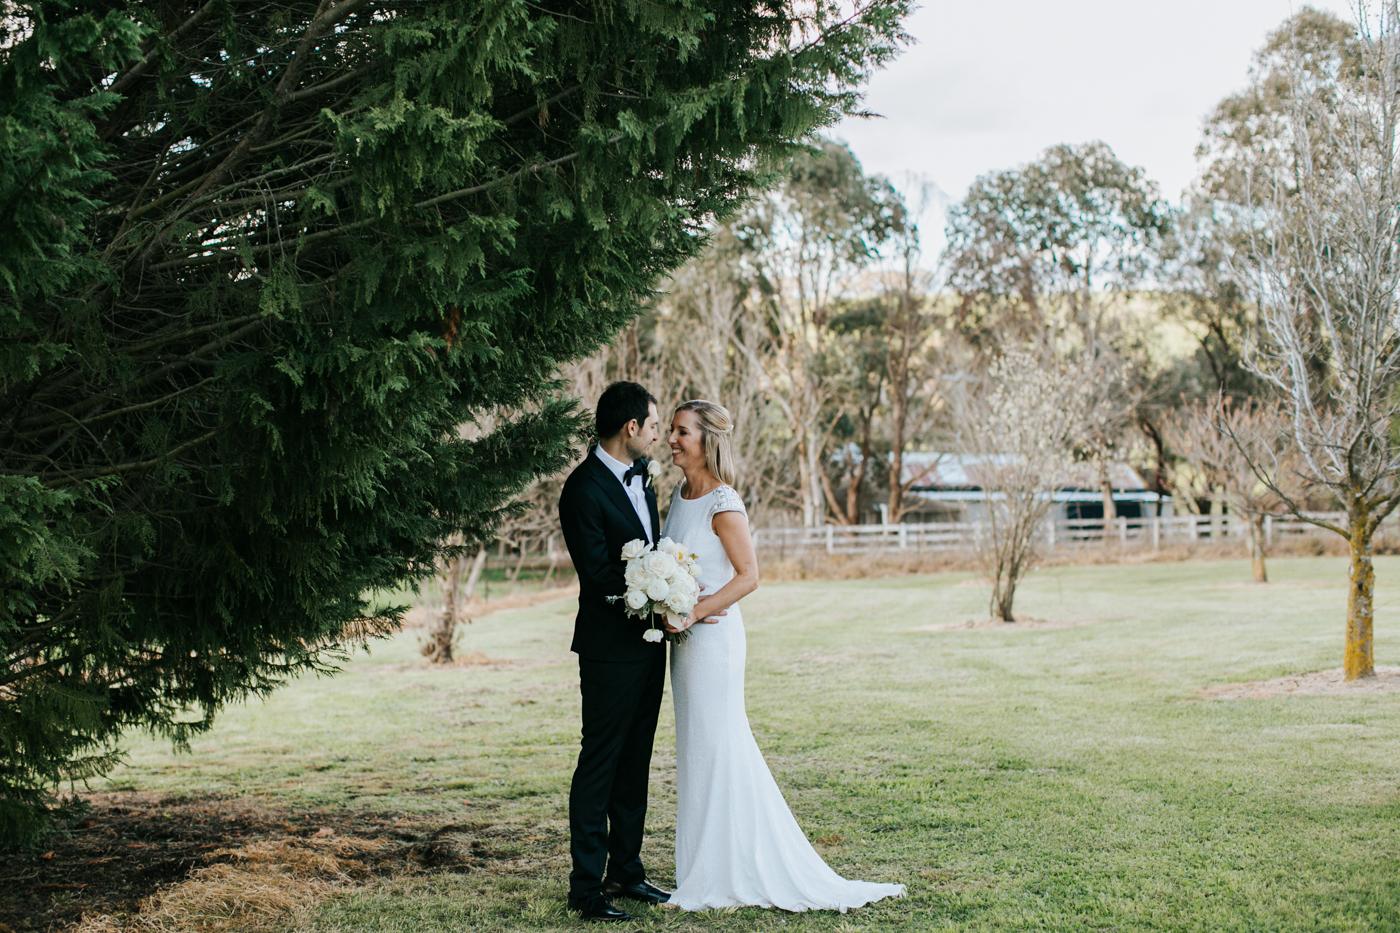 Bridget & James - Orange Country Wedding - Samantha Heather Photography-137.jpg